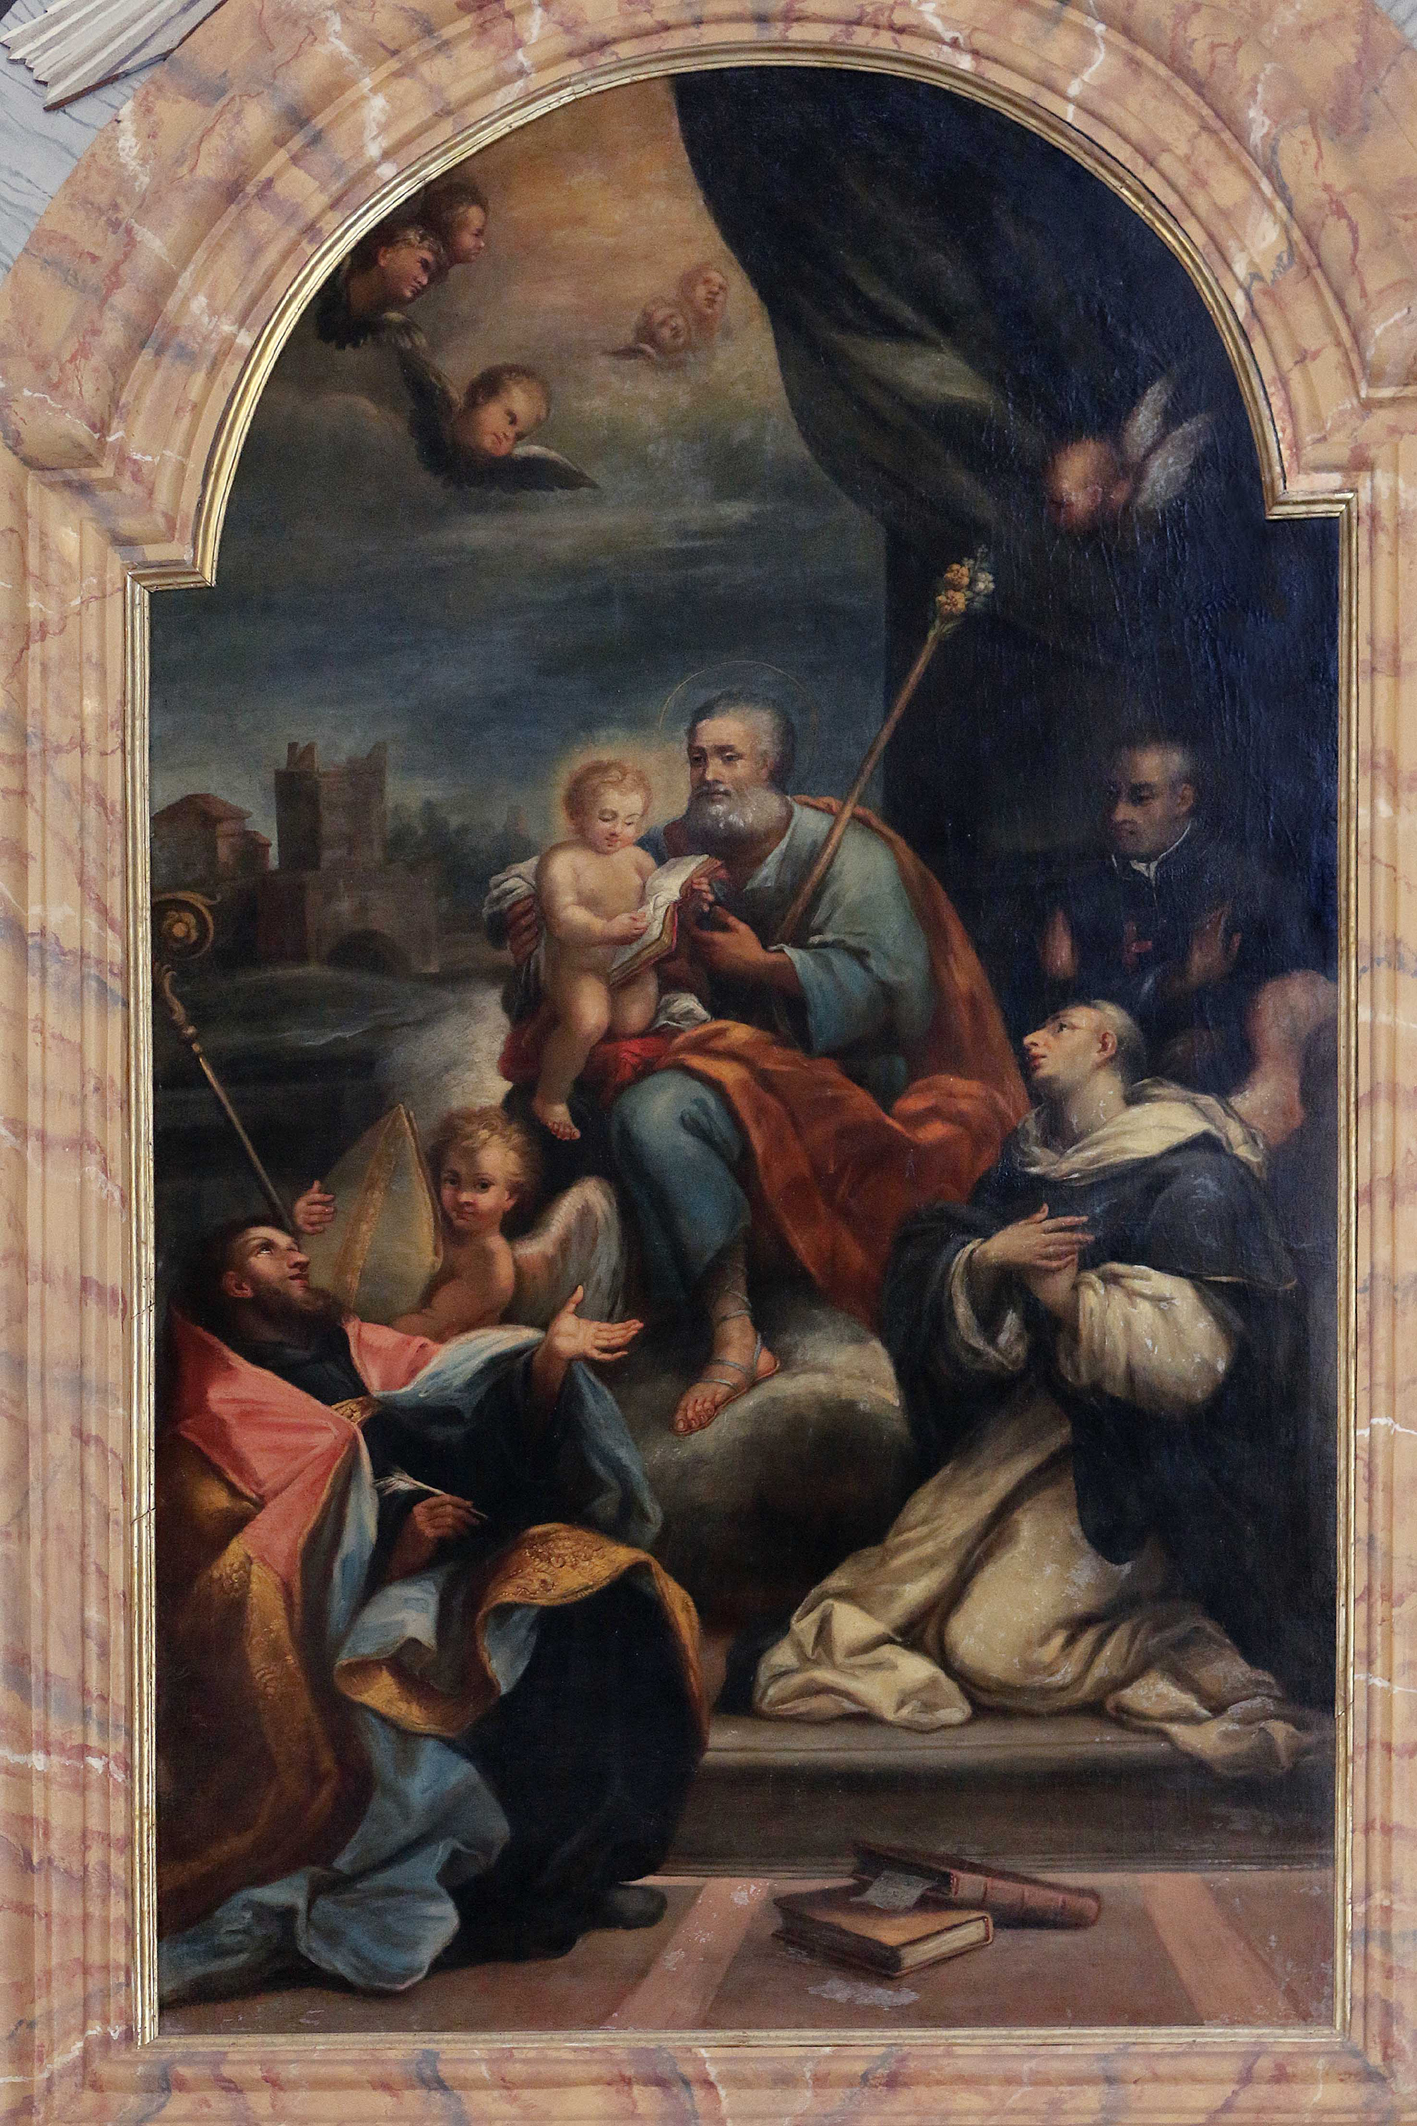 ill. 2 : Autore Ignoto (sec. XVIII), San Giuseppe